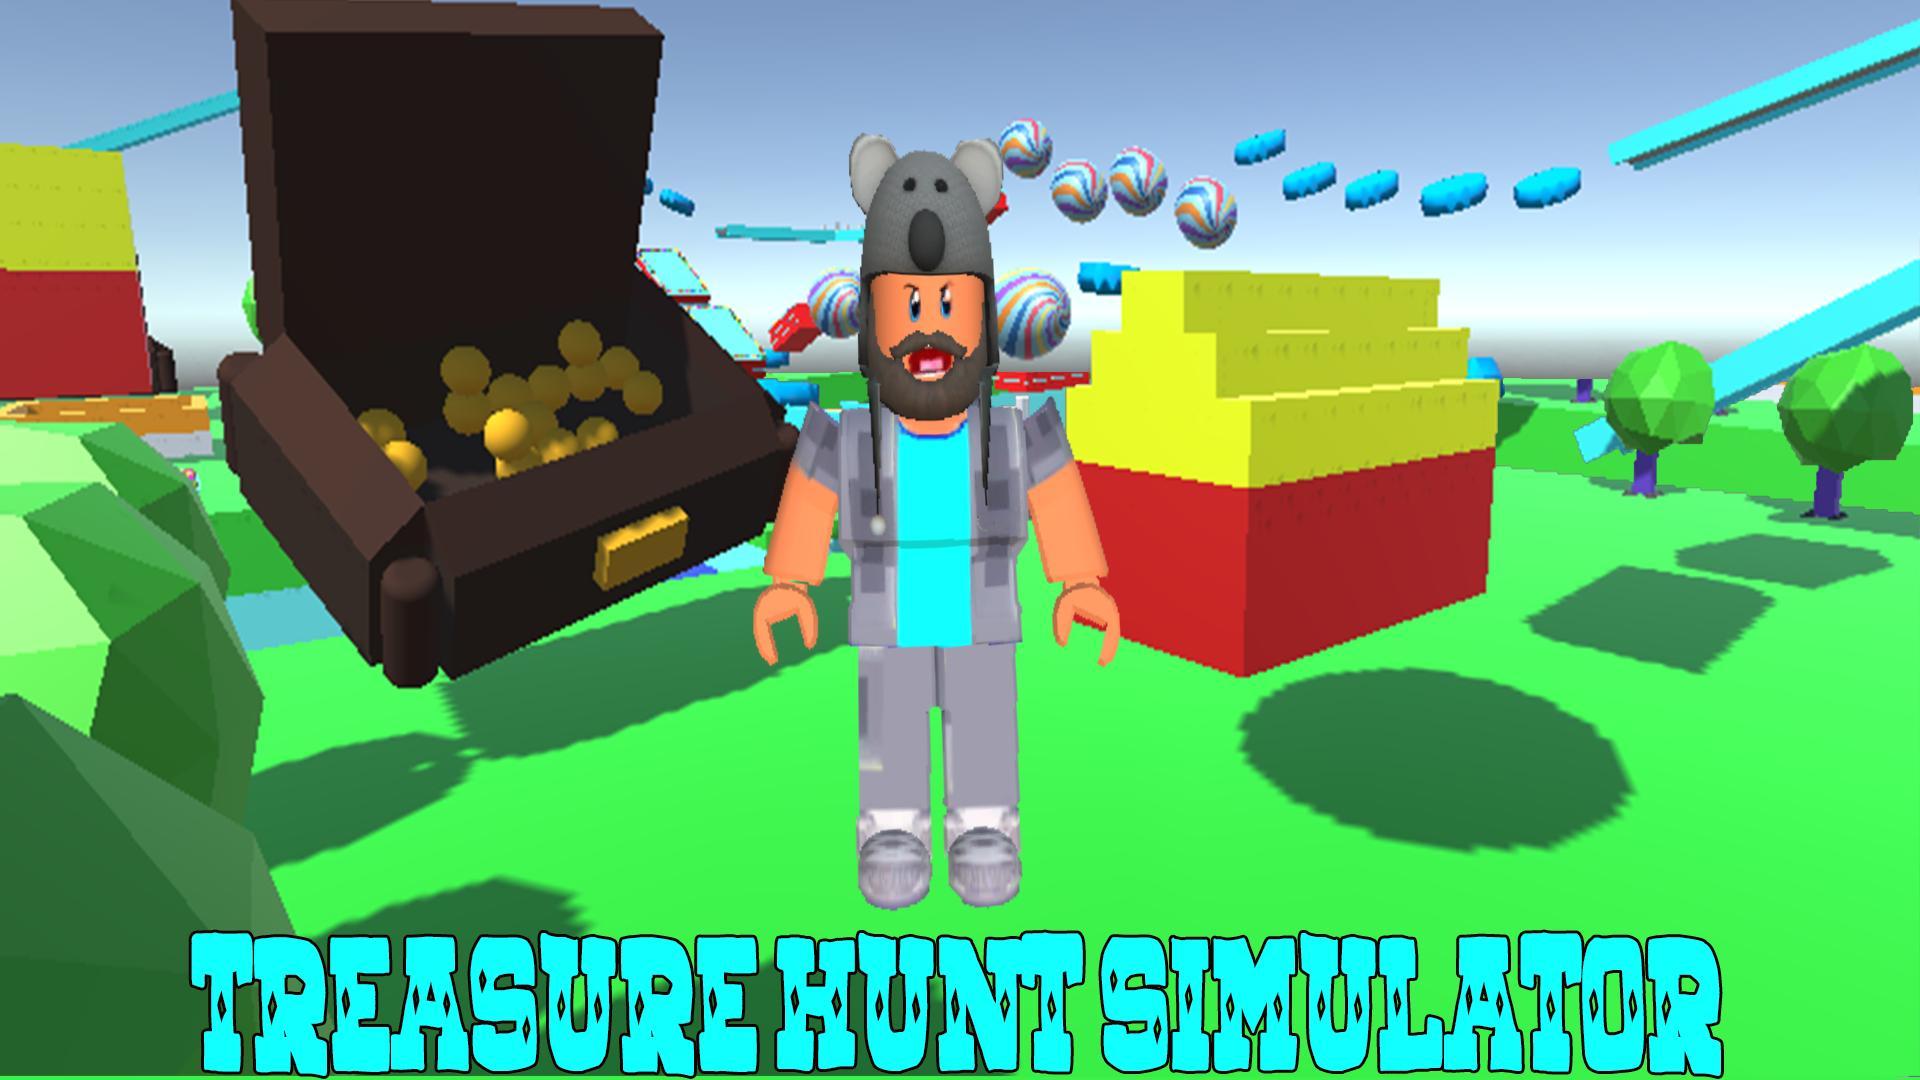 Roblox Treasure Hunt Simulator Roblox Apk Gameplay Treasure Hunt Simulator Roblox S Obby Mod For Android Apk Download